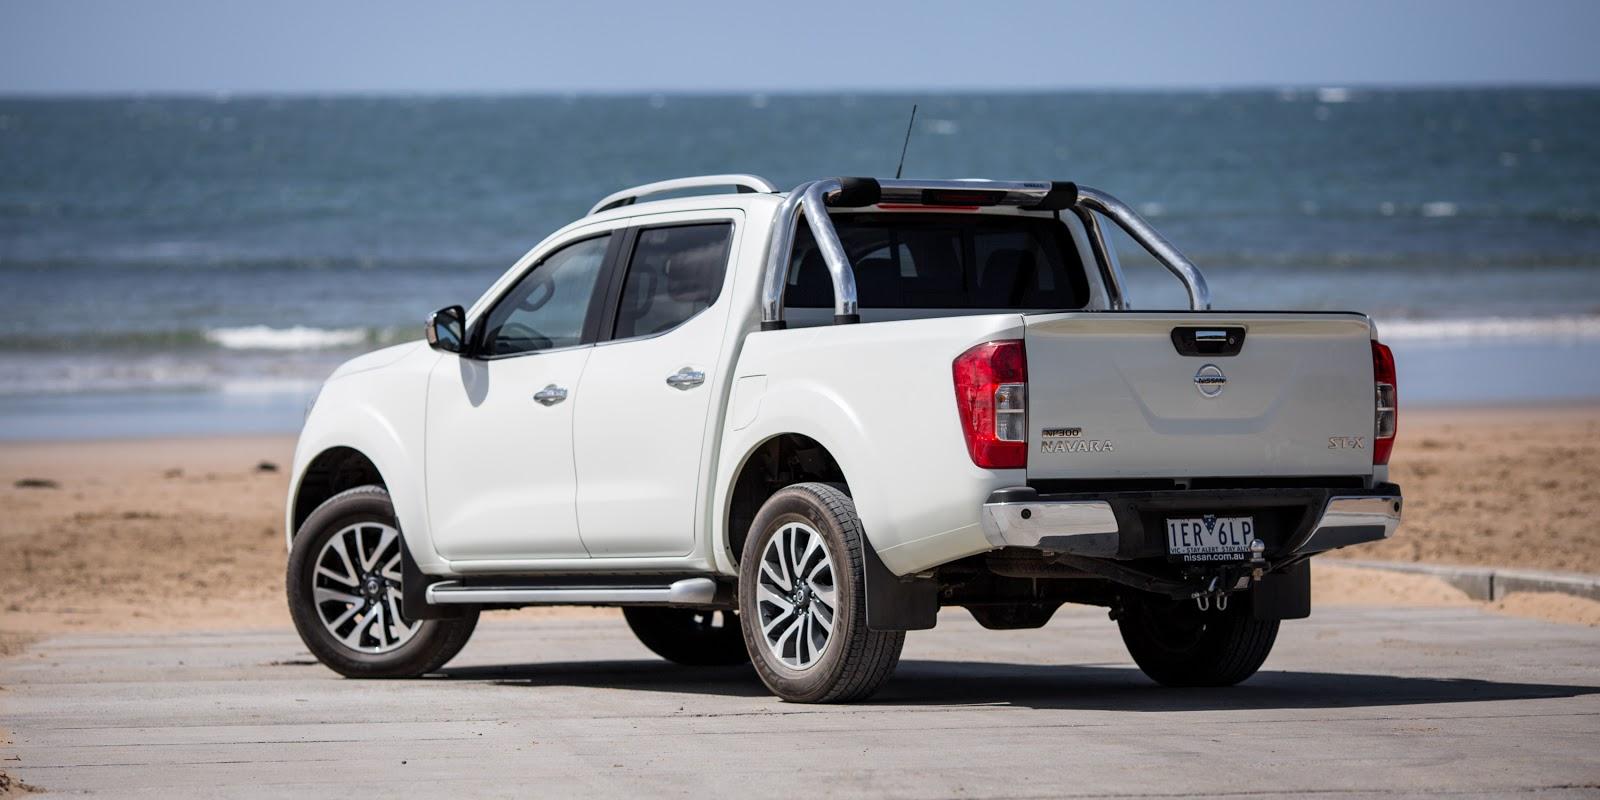 Đánh giá xe Nissan Navara 2016